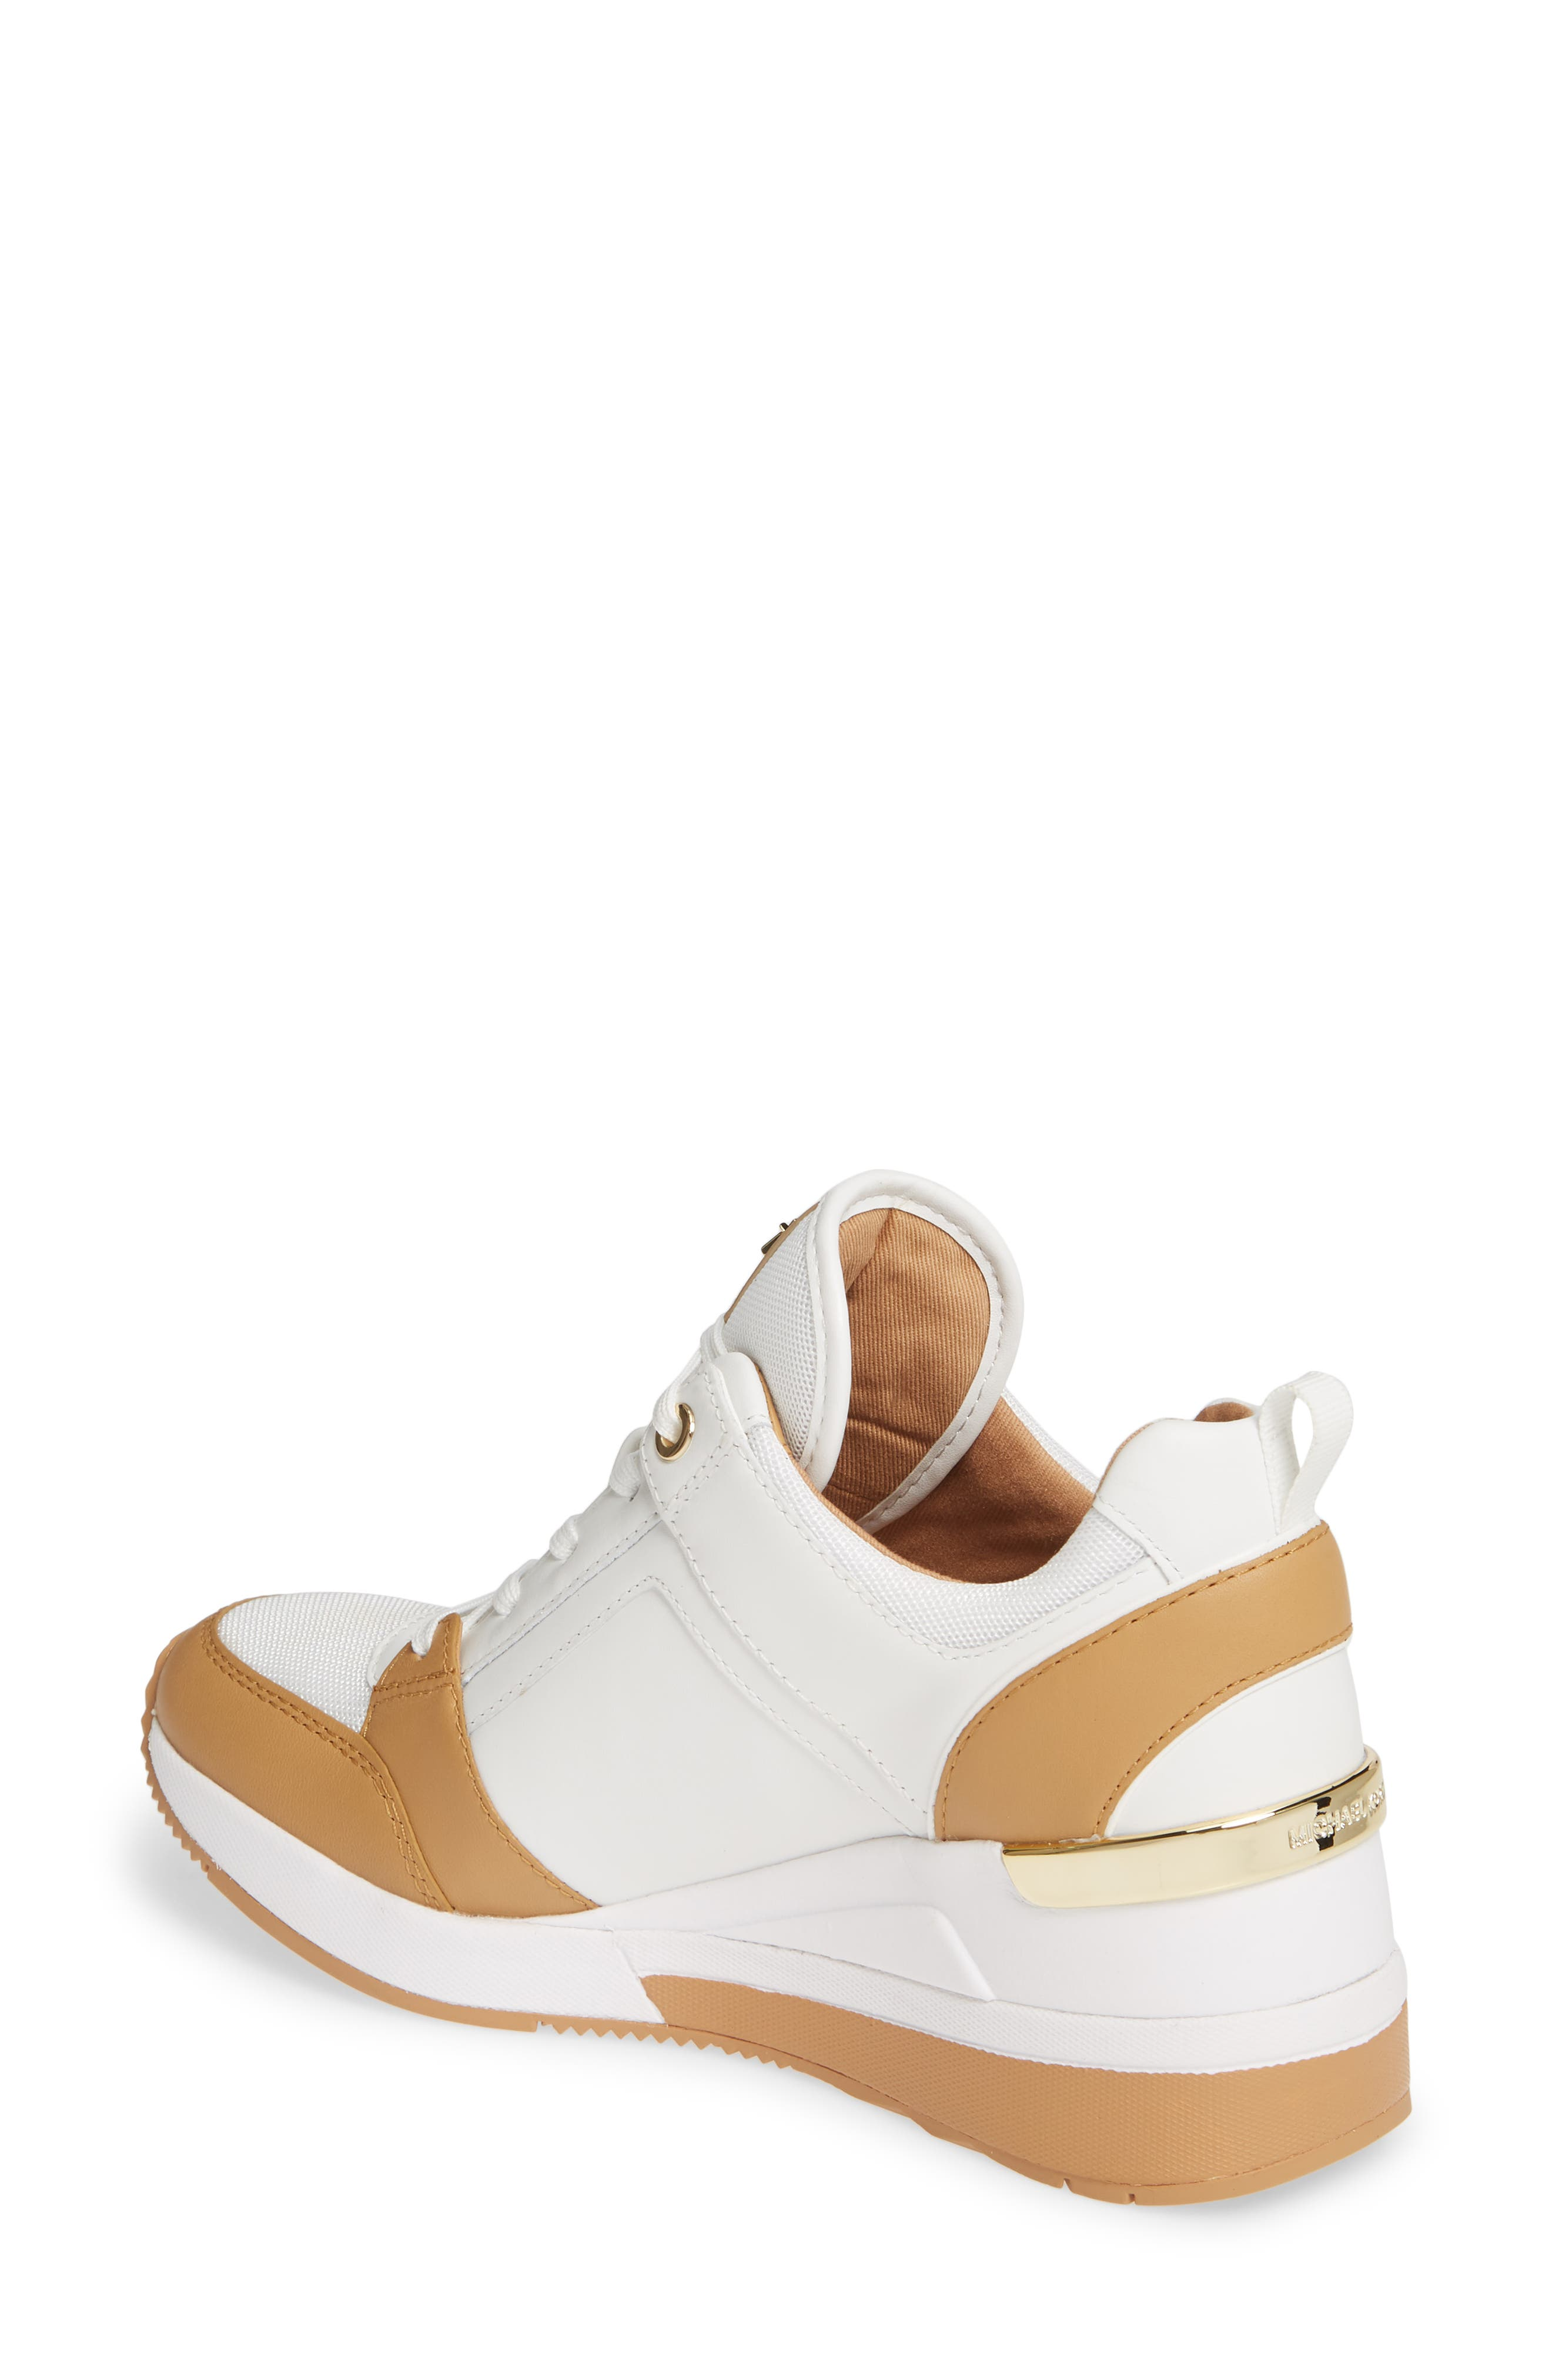 MICHAEL MICHAEL KORS,                             Georgie Wedge Sneaker,                             Alternate thumbnail 2, color,                             OPTIC WHITE MULTI